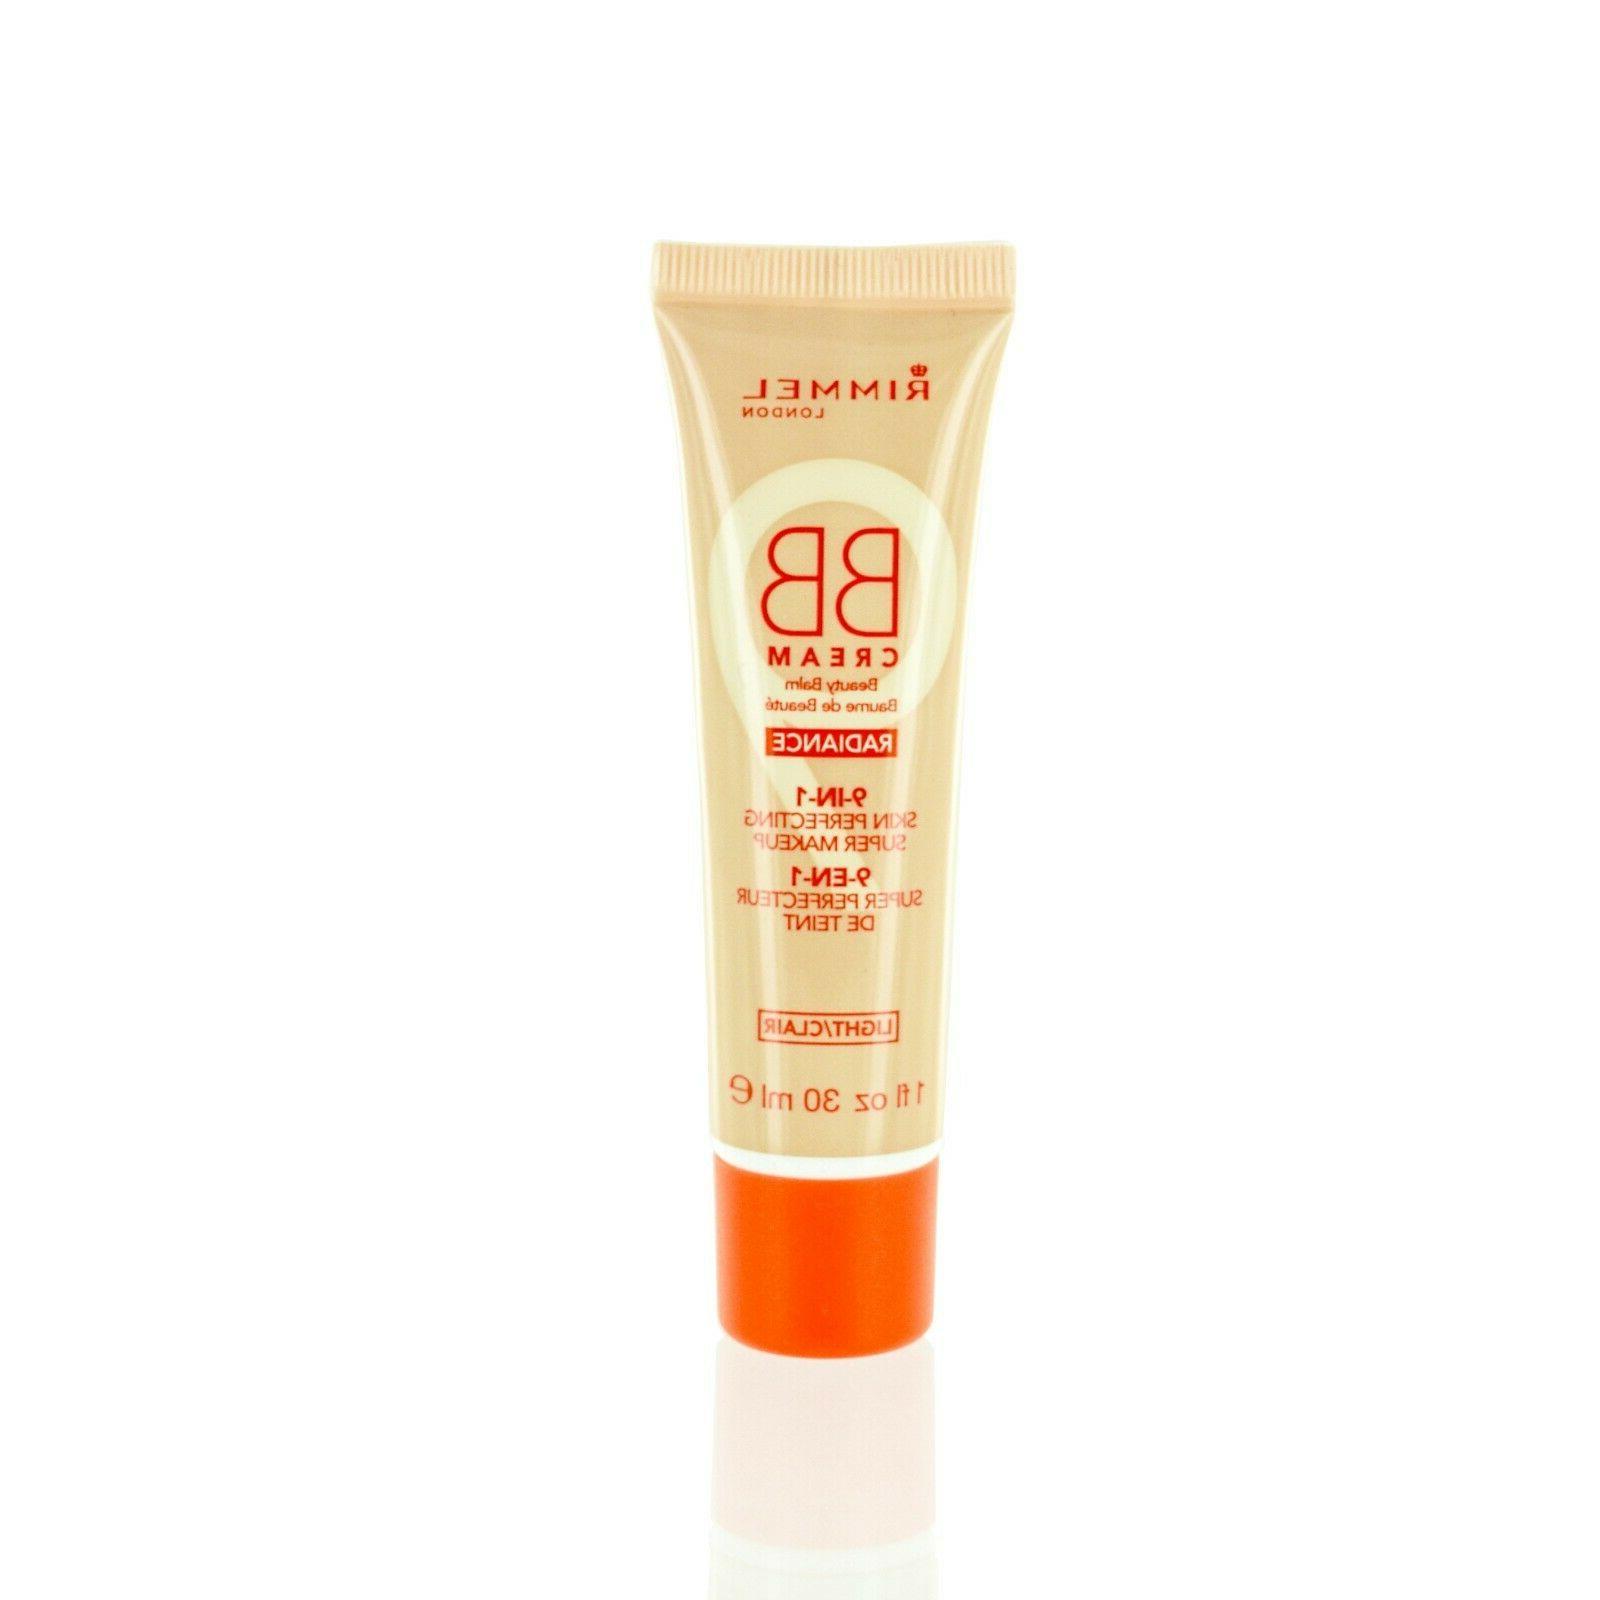 Rimmel London Radiance BB Cream Super Makeup, Light 1.0 oz